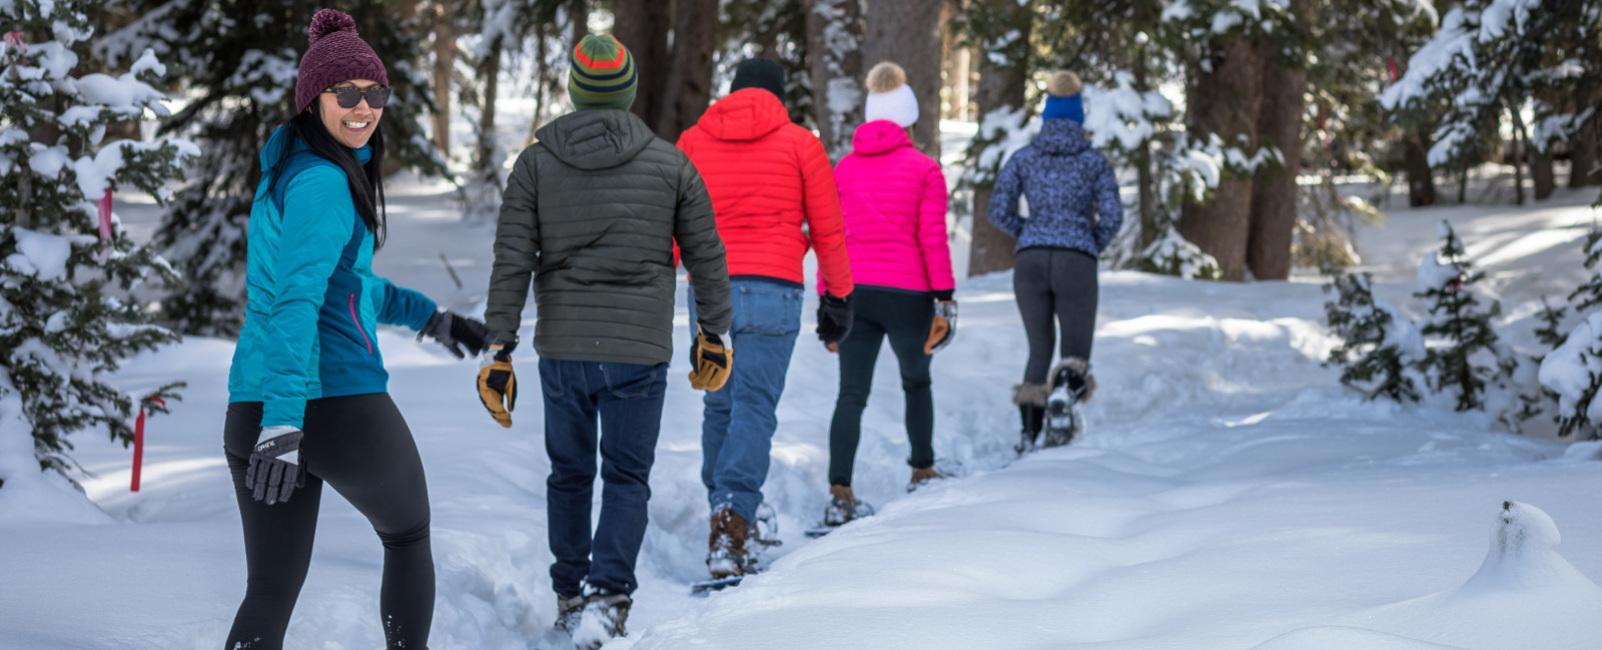 The 5 Best Snowshoeing Trails in Utah